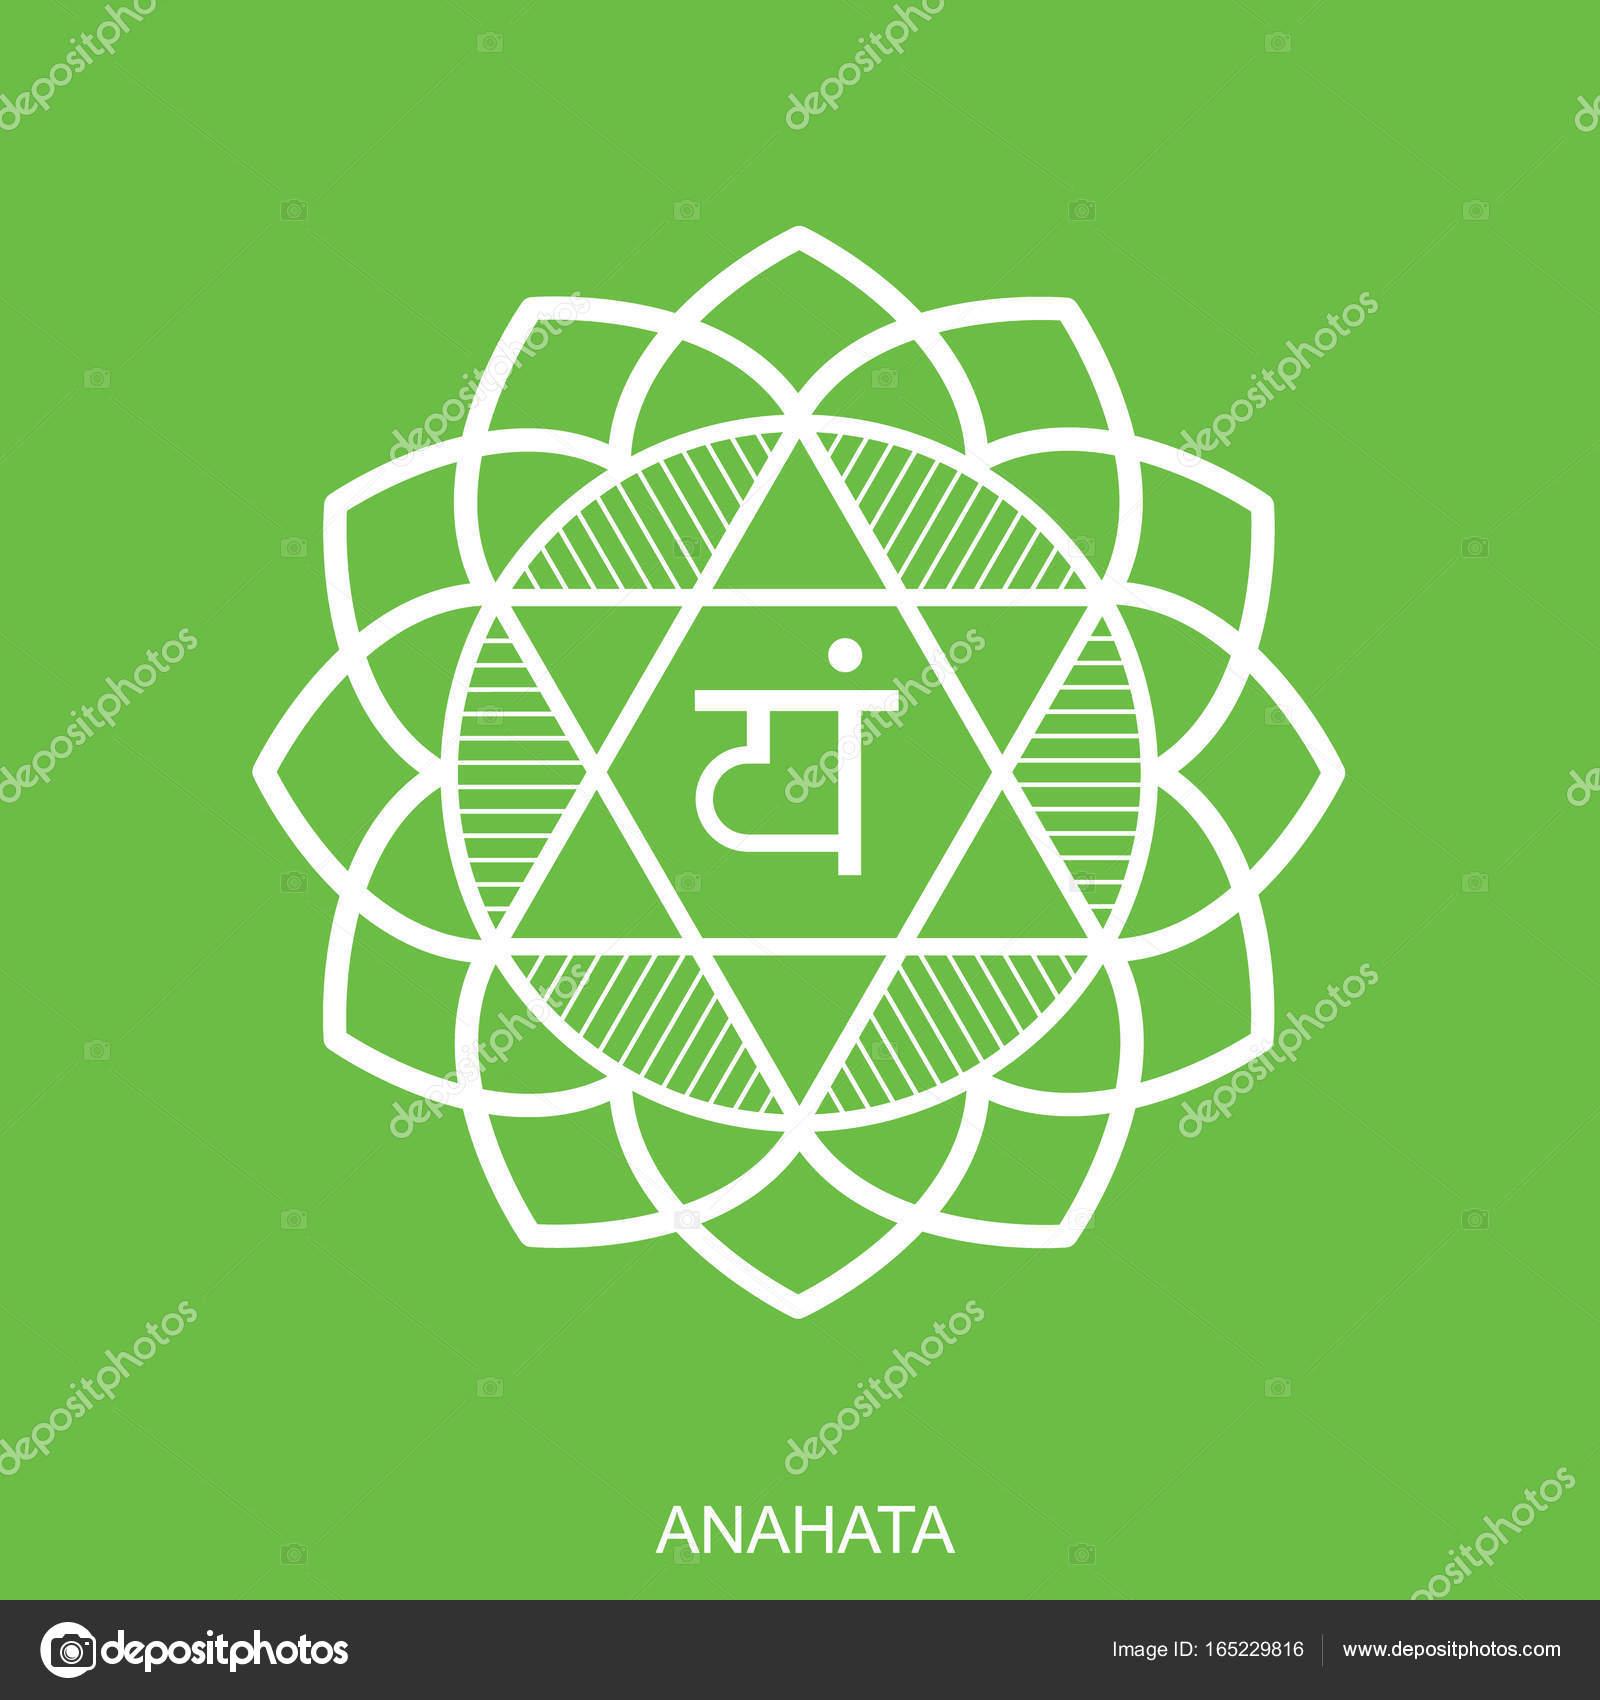 Anahata chakra vector isolated minimalistic flat icon for yoga chakra vector isolated minimalistic flat icon for yoga studio banner poster symbol used in hinduism buddhism and ayurveda editable concept buycottarizona Gallery